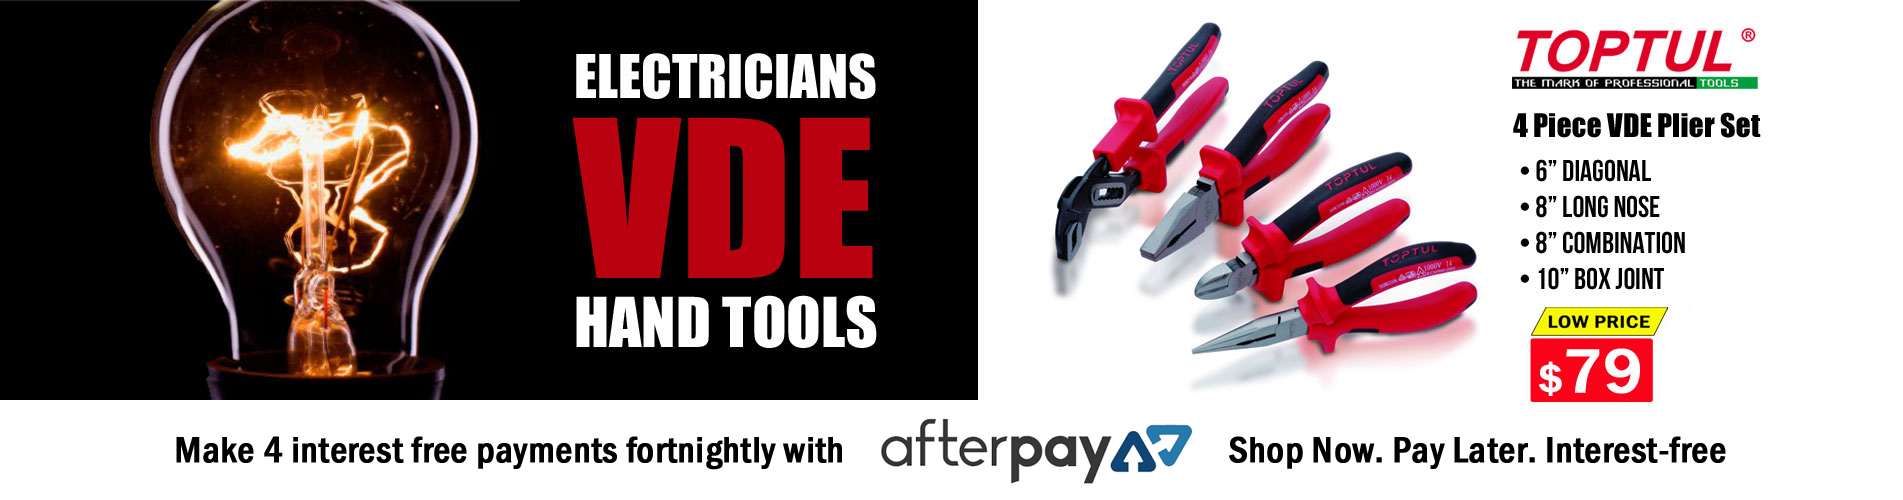 Toptul Tools Electrican VDE Pliers - Lifetime Warranty - Audel Tools